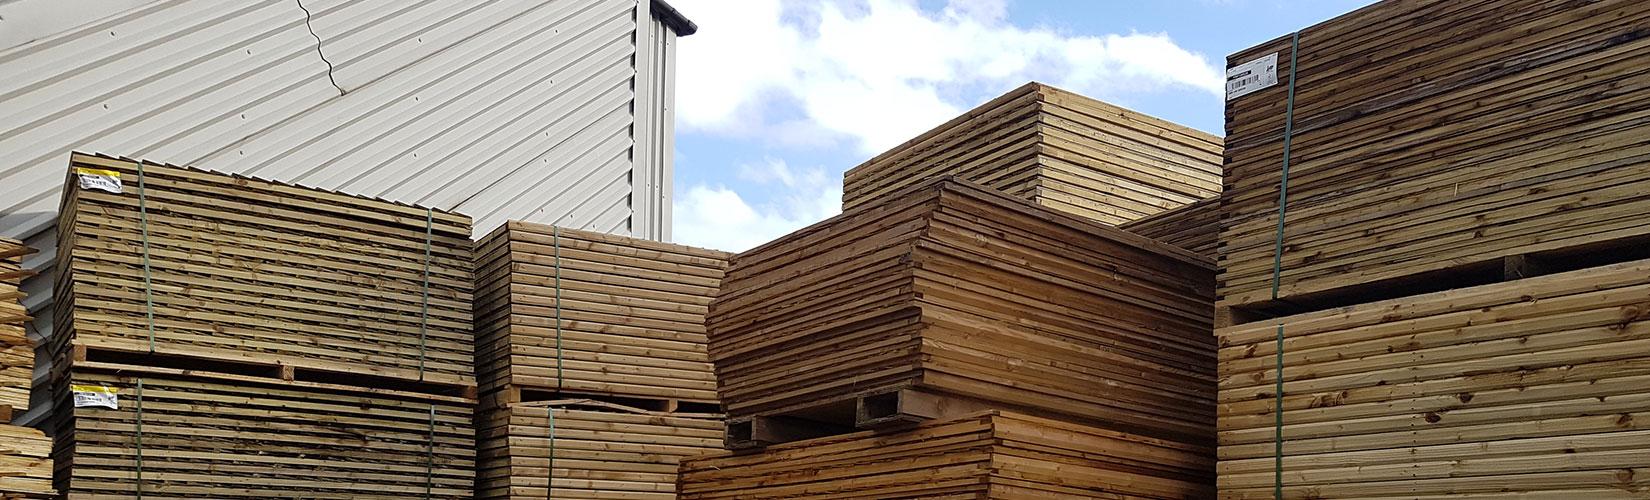 Wood Supplier Greenwich Timber Merchants Se10 Railway